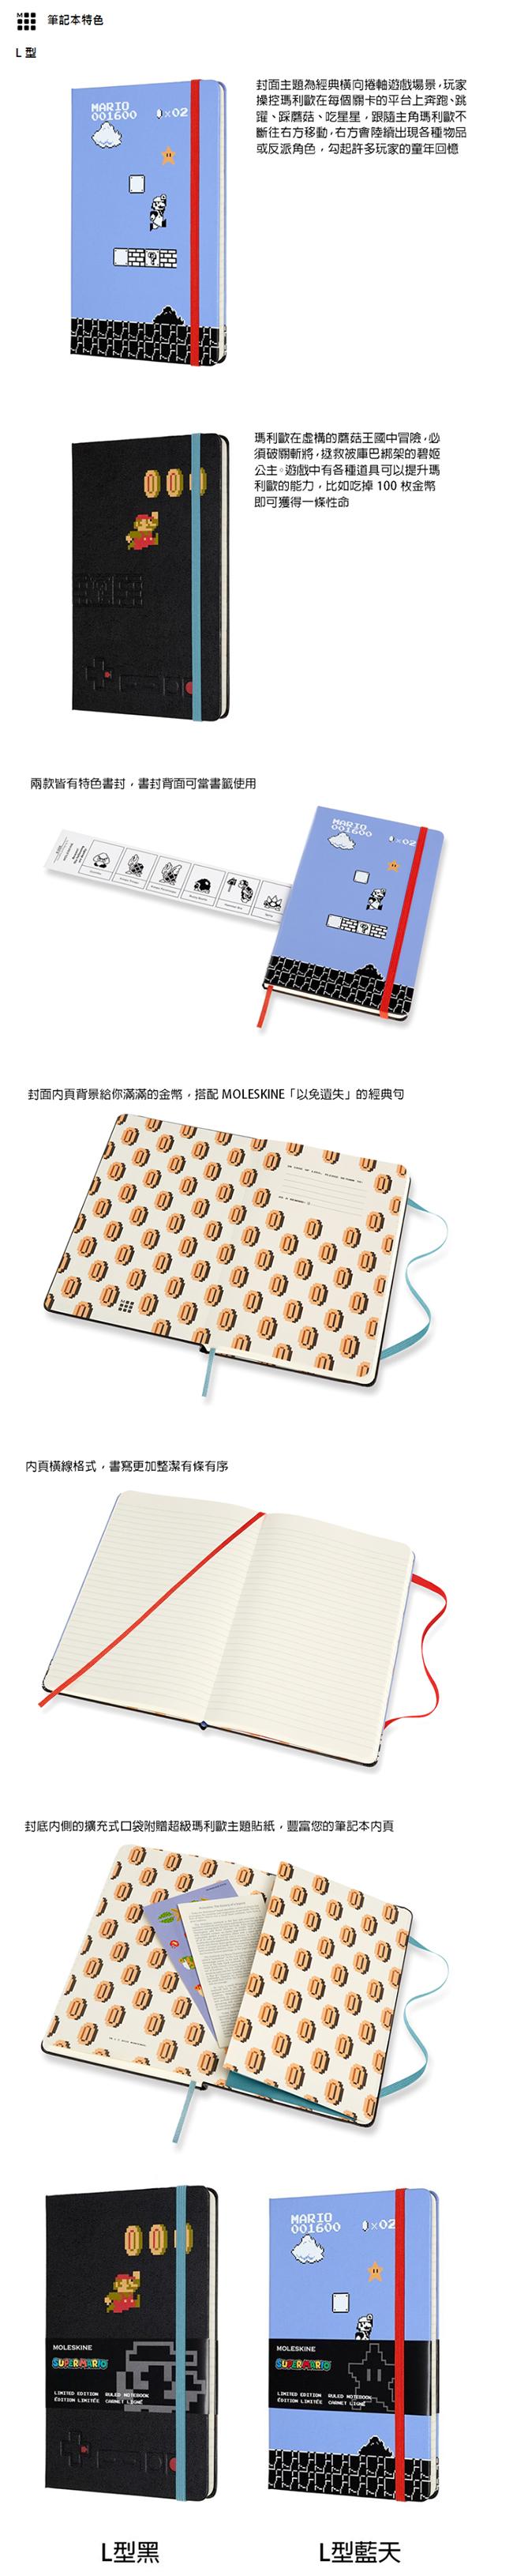 MOLESKINE 超級瑪利歐限定版筆記本(L型橫線)-藍天